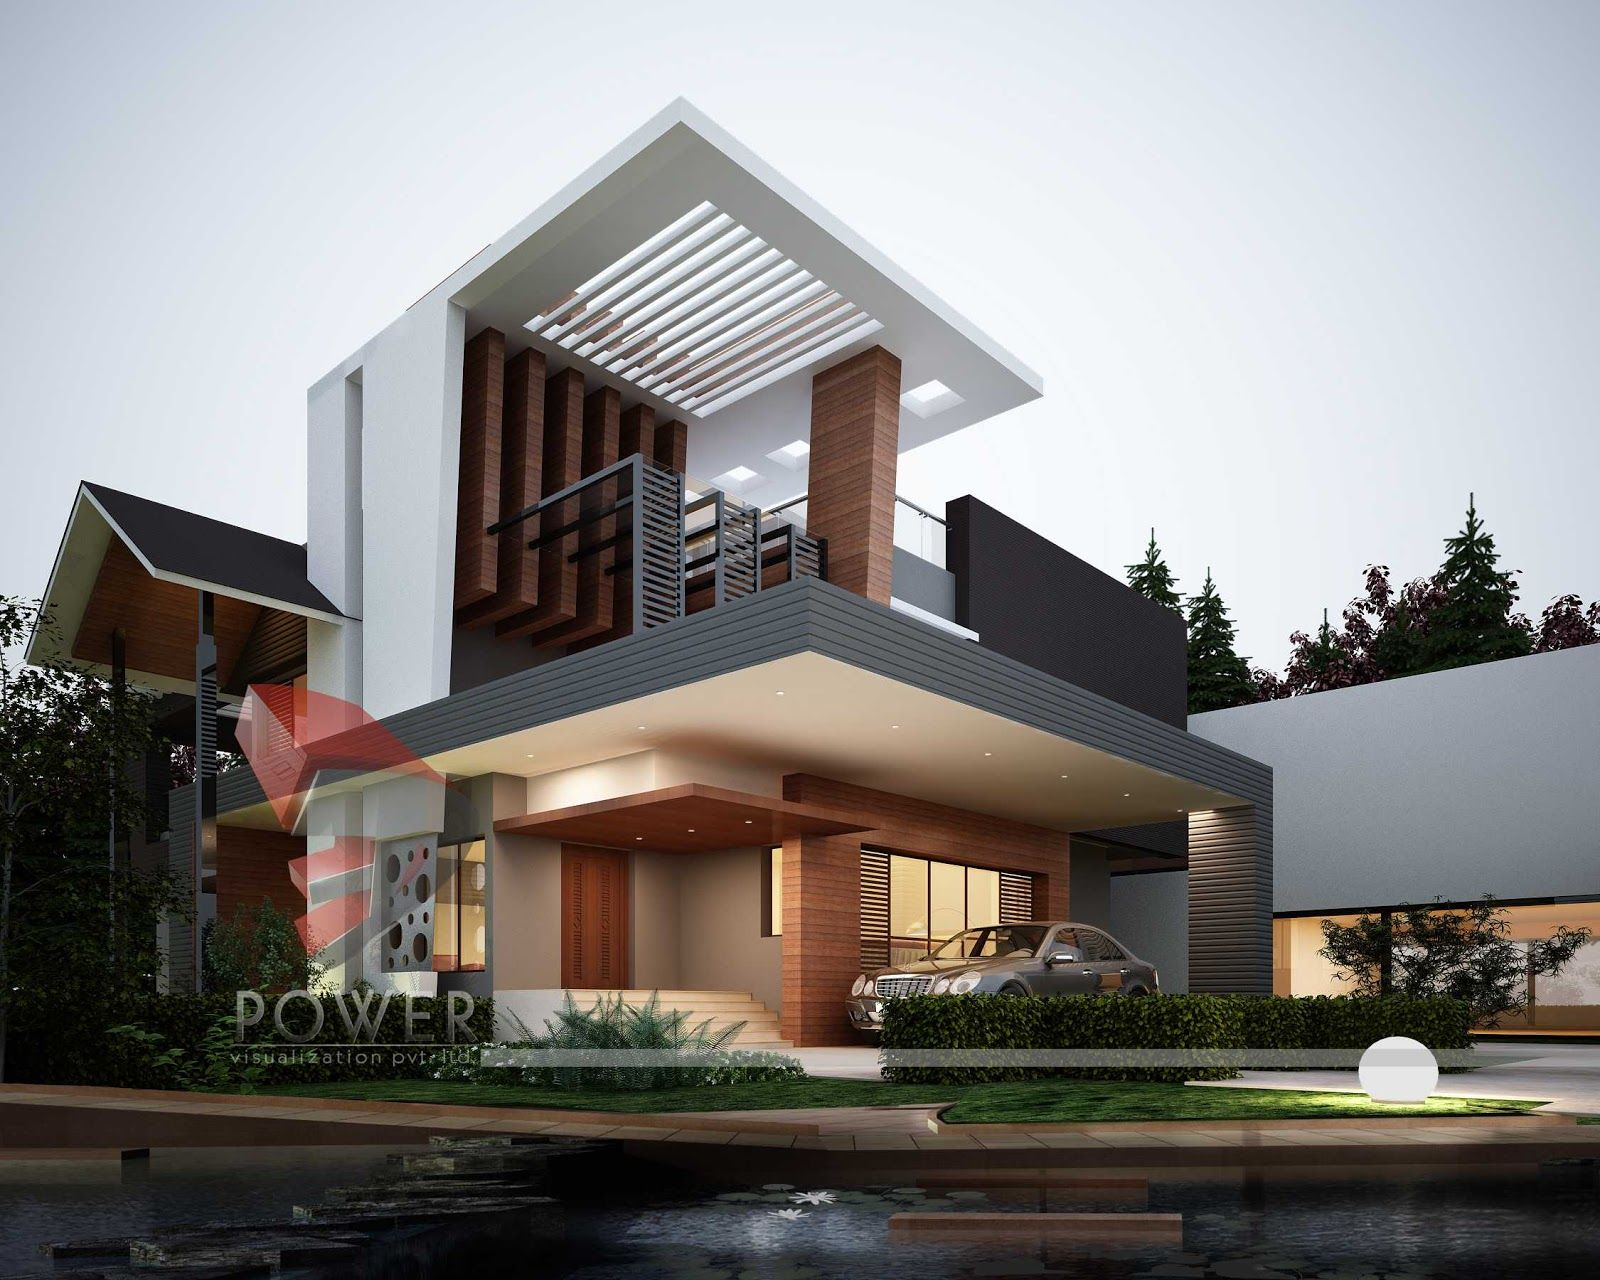 Modern Architecture Houses 6 Semidetached Homes Fair Design Ideas